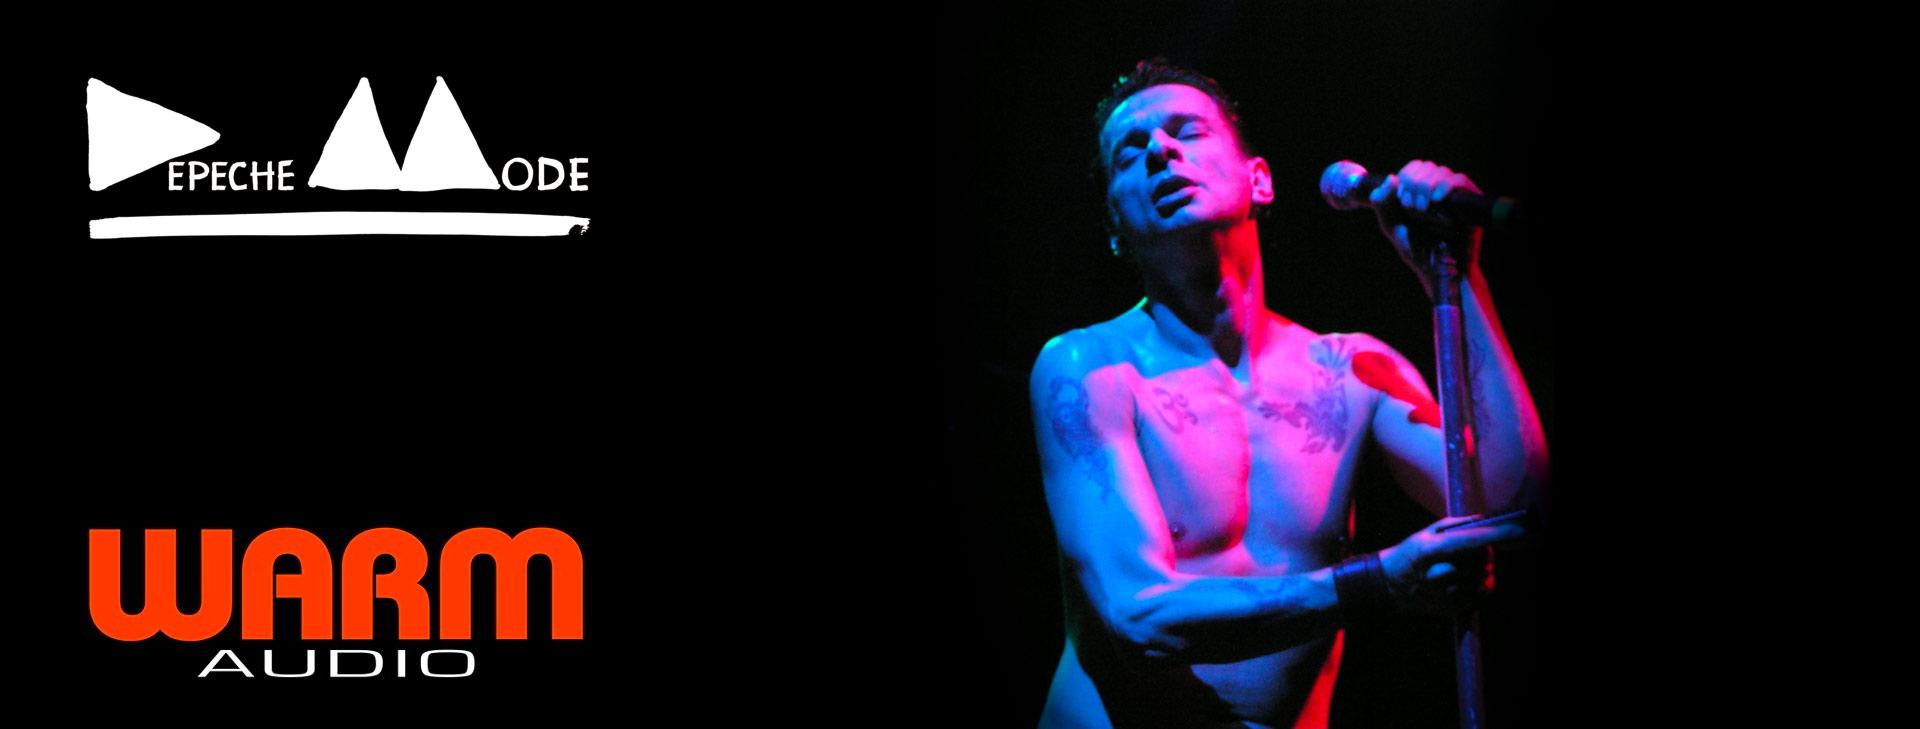 depeche mode live warm audio